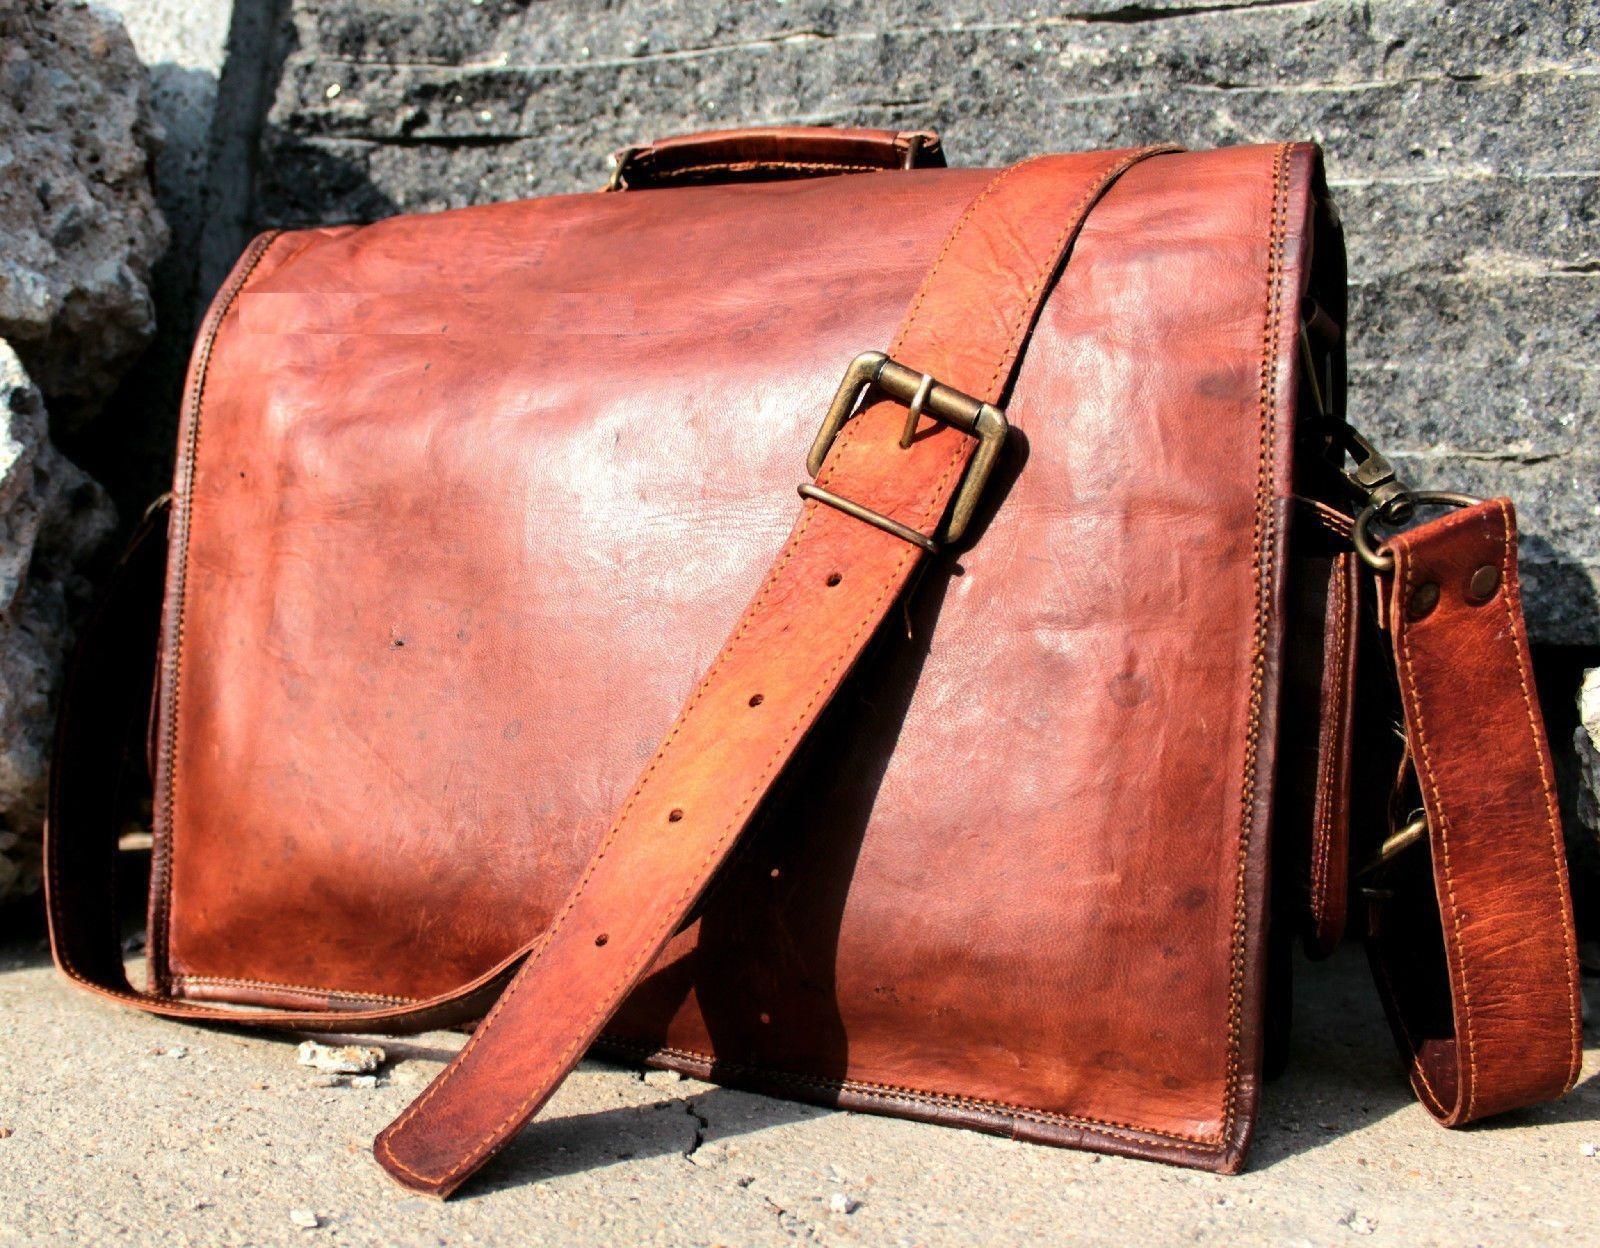 08cbb9d973c1 57. 57. Previous. New Men s Genuine Brown Leather Vintage Laptop Messenger  Shoulder Briefcase Bag · New Men s Genuine ...